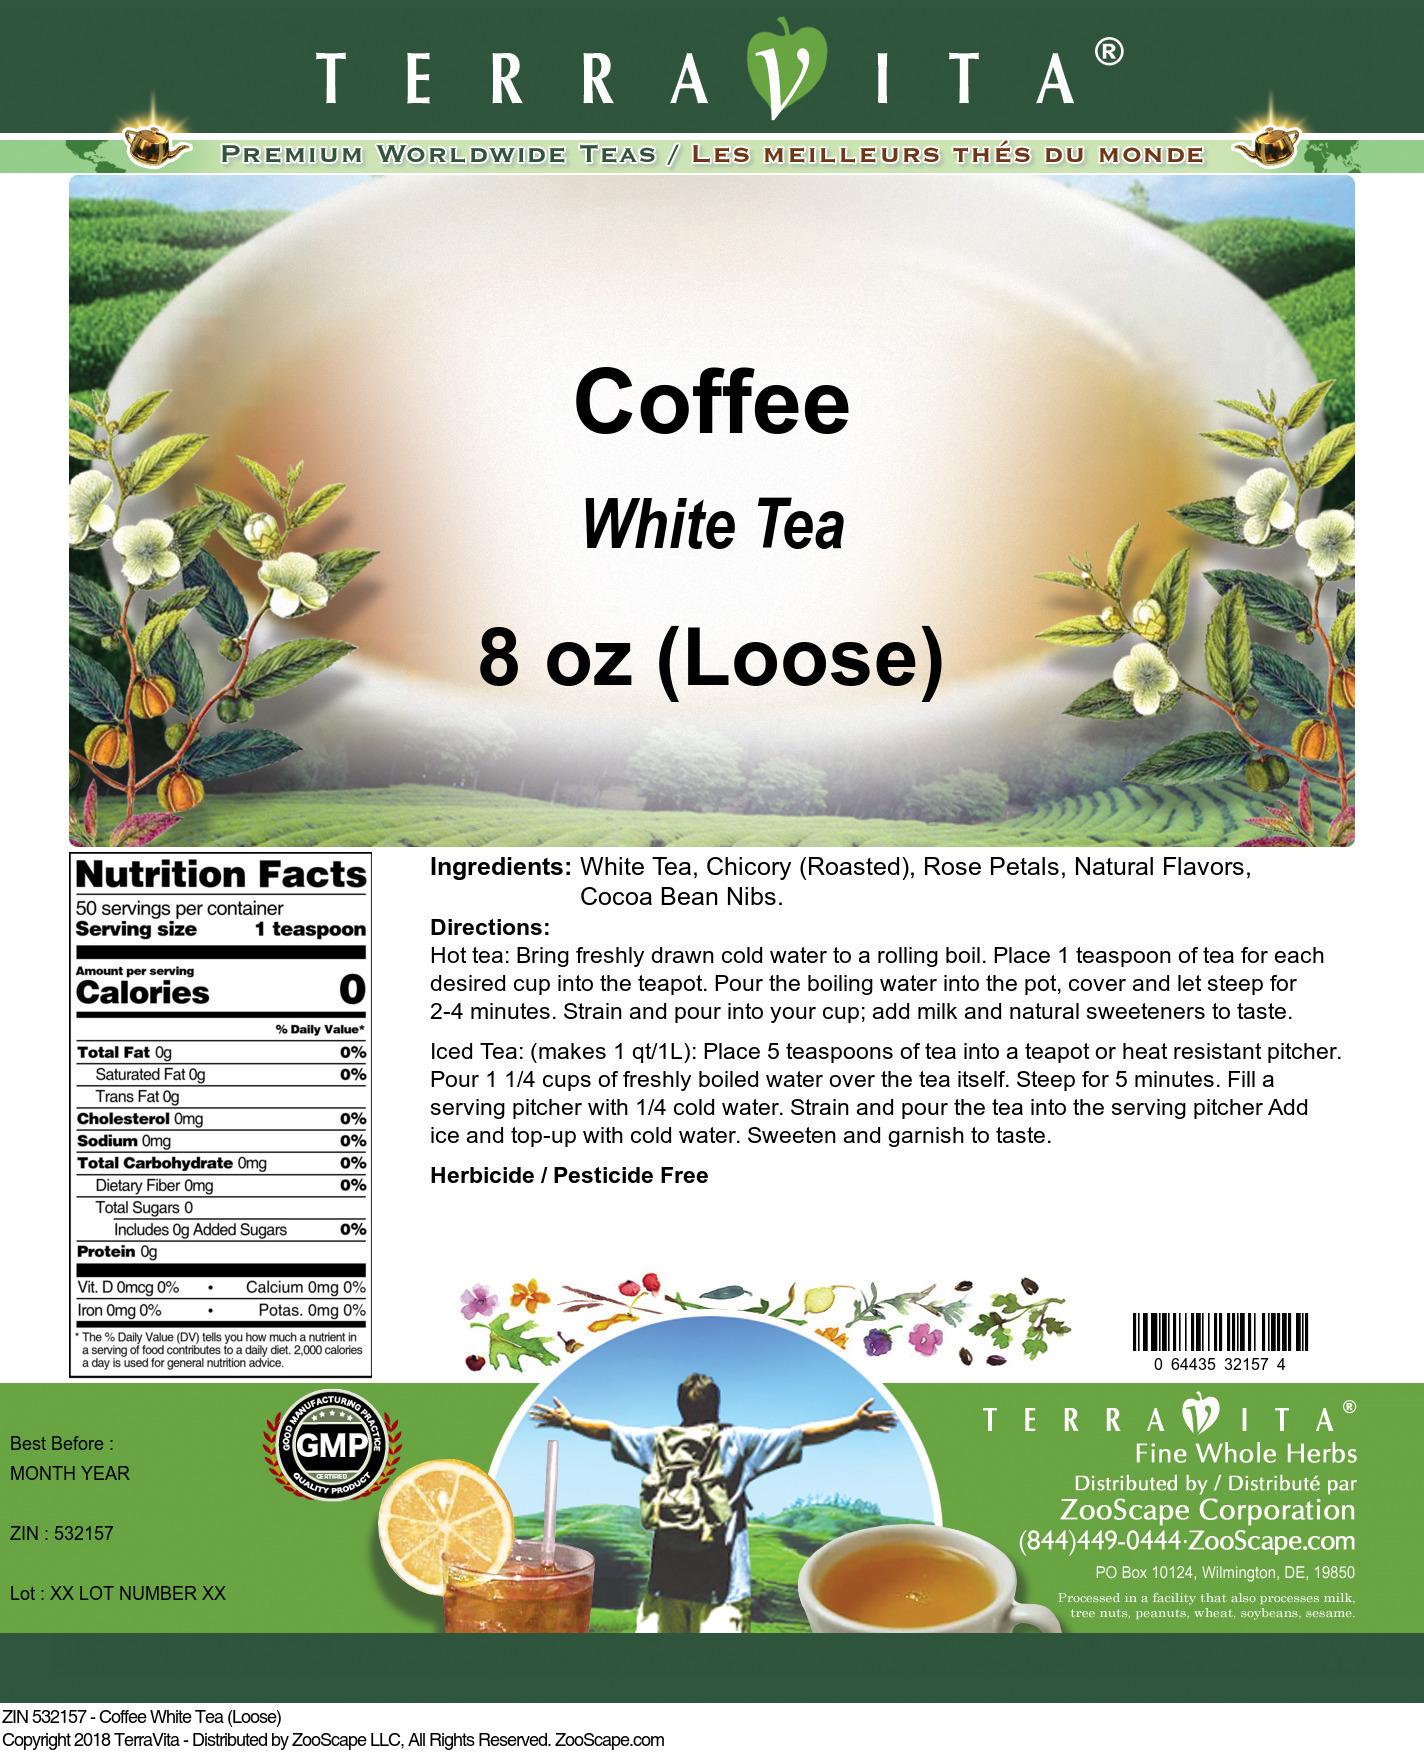 Coffee White Tea